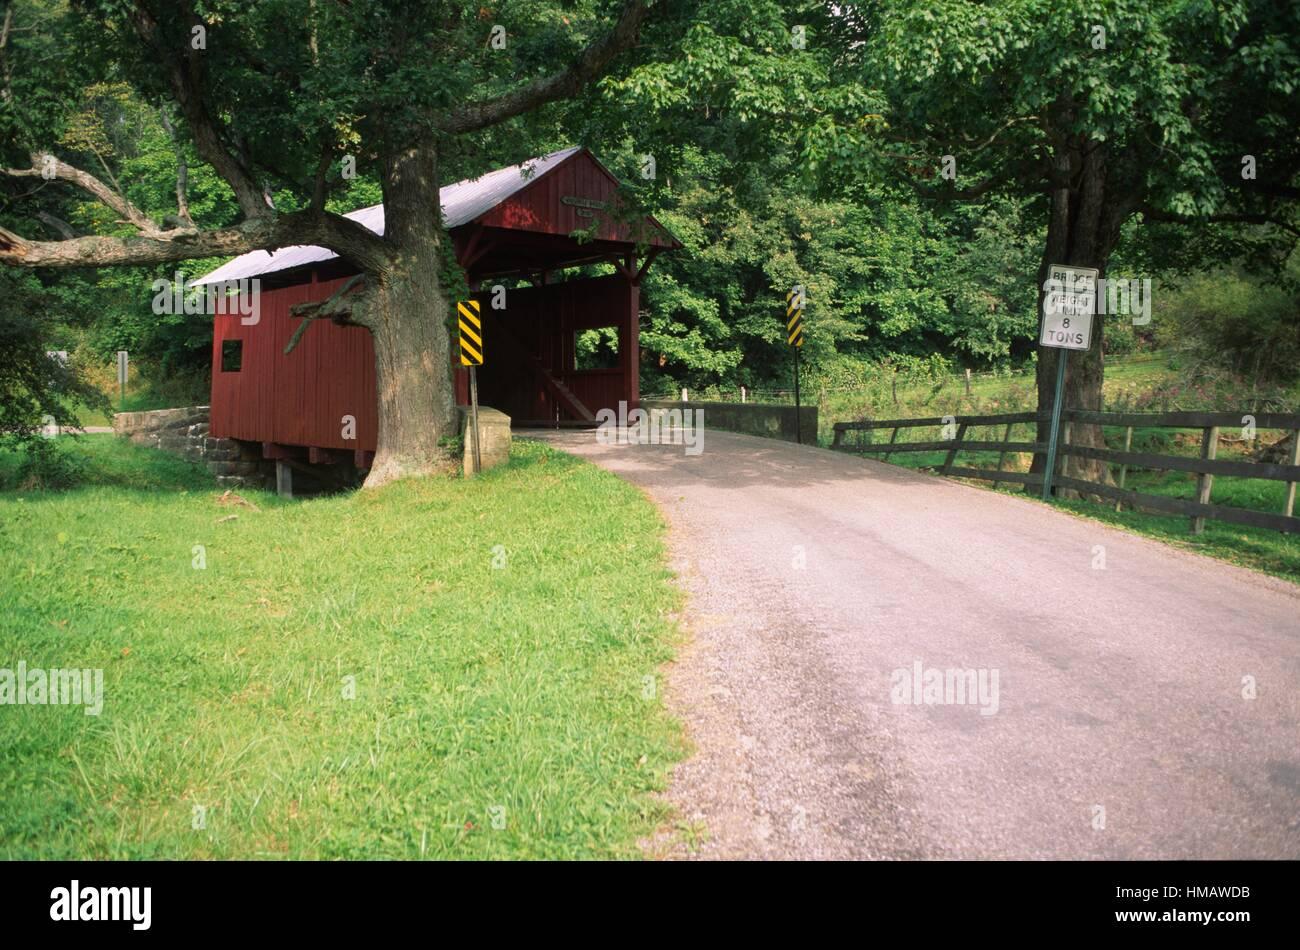 Brownlee Covered Bridge (original location), Washington County, Pennsylvania. - Stock Image